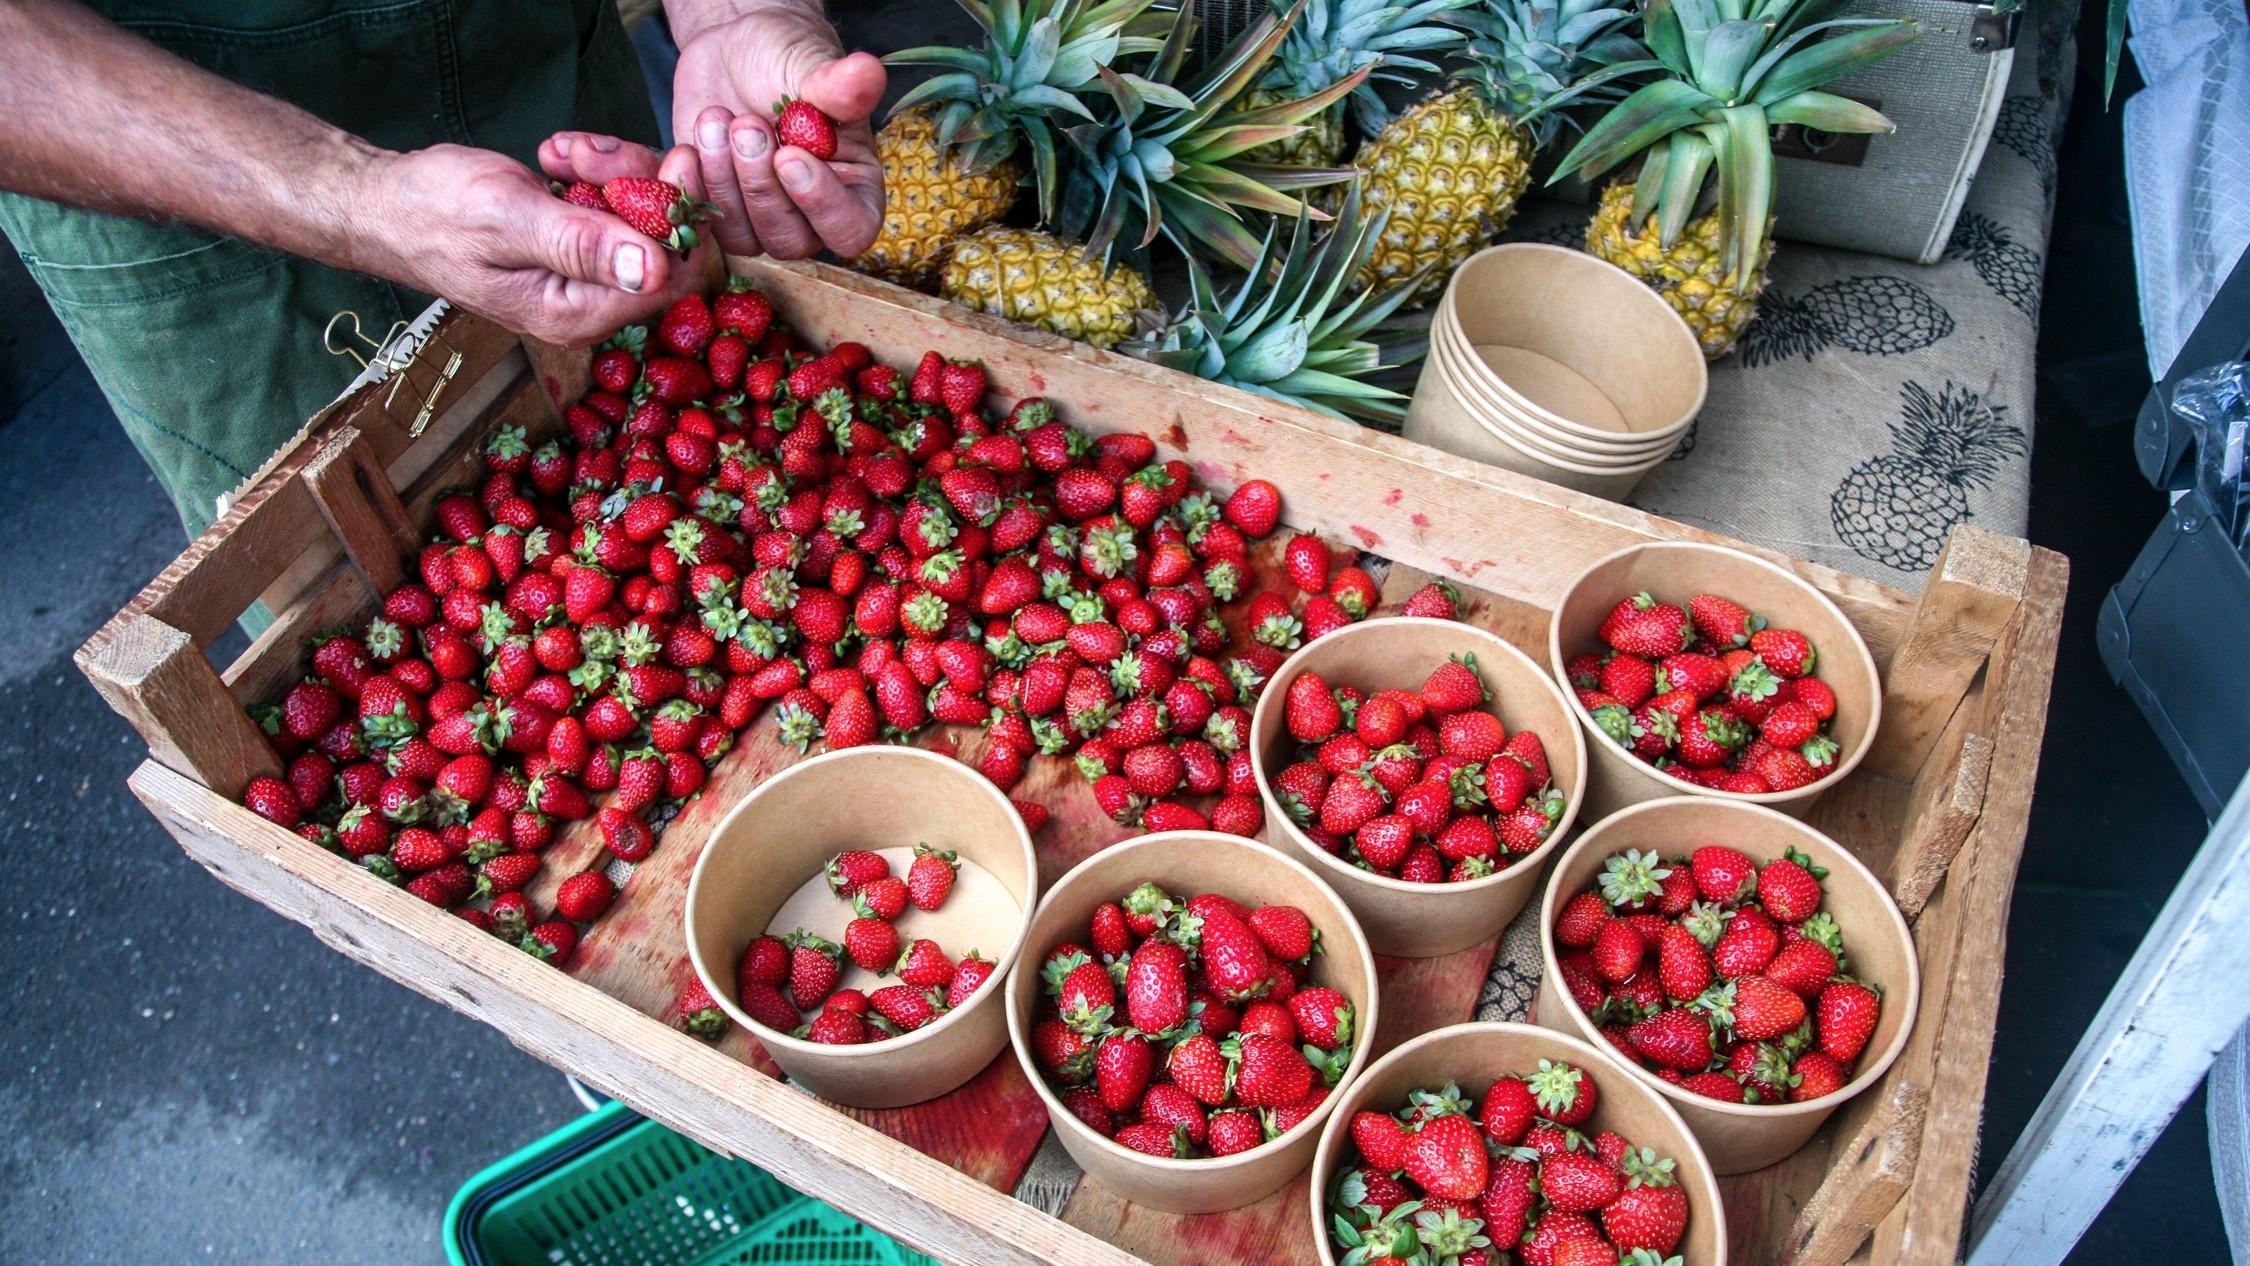 Strawberries at Orange Grove Markets